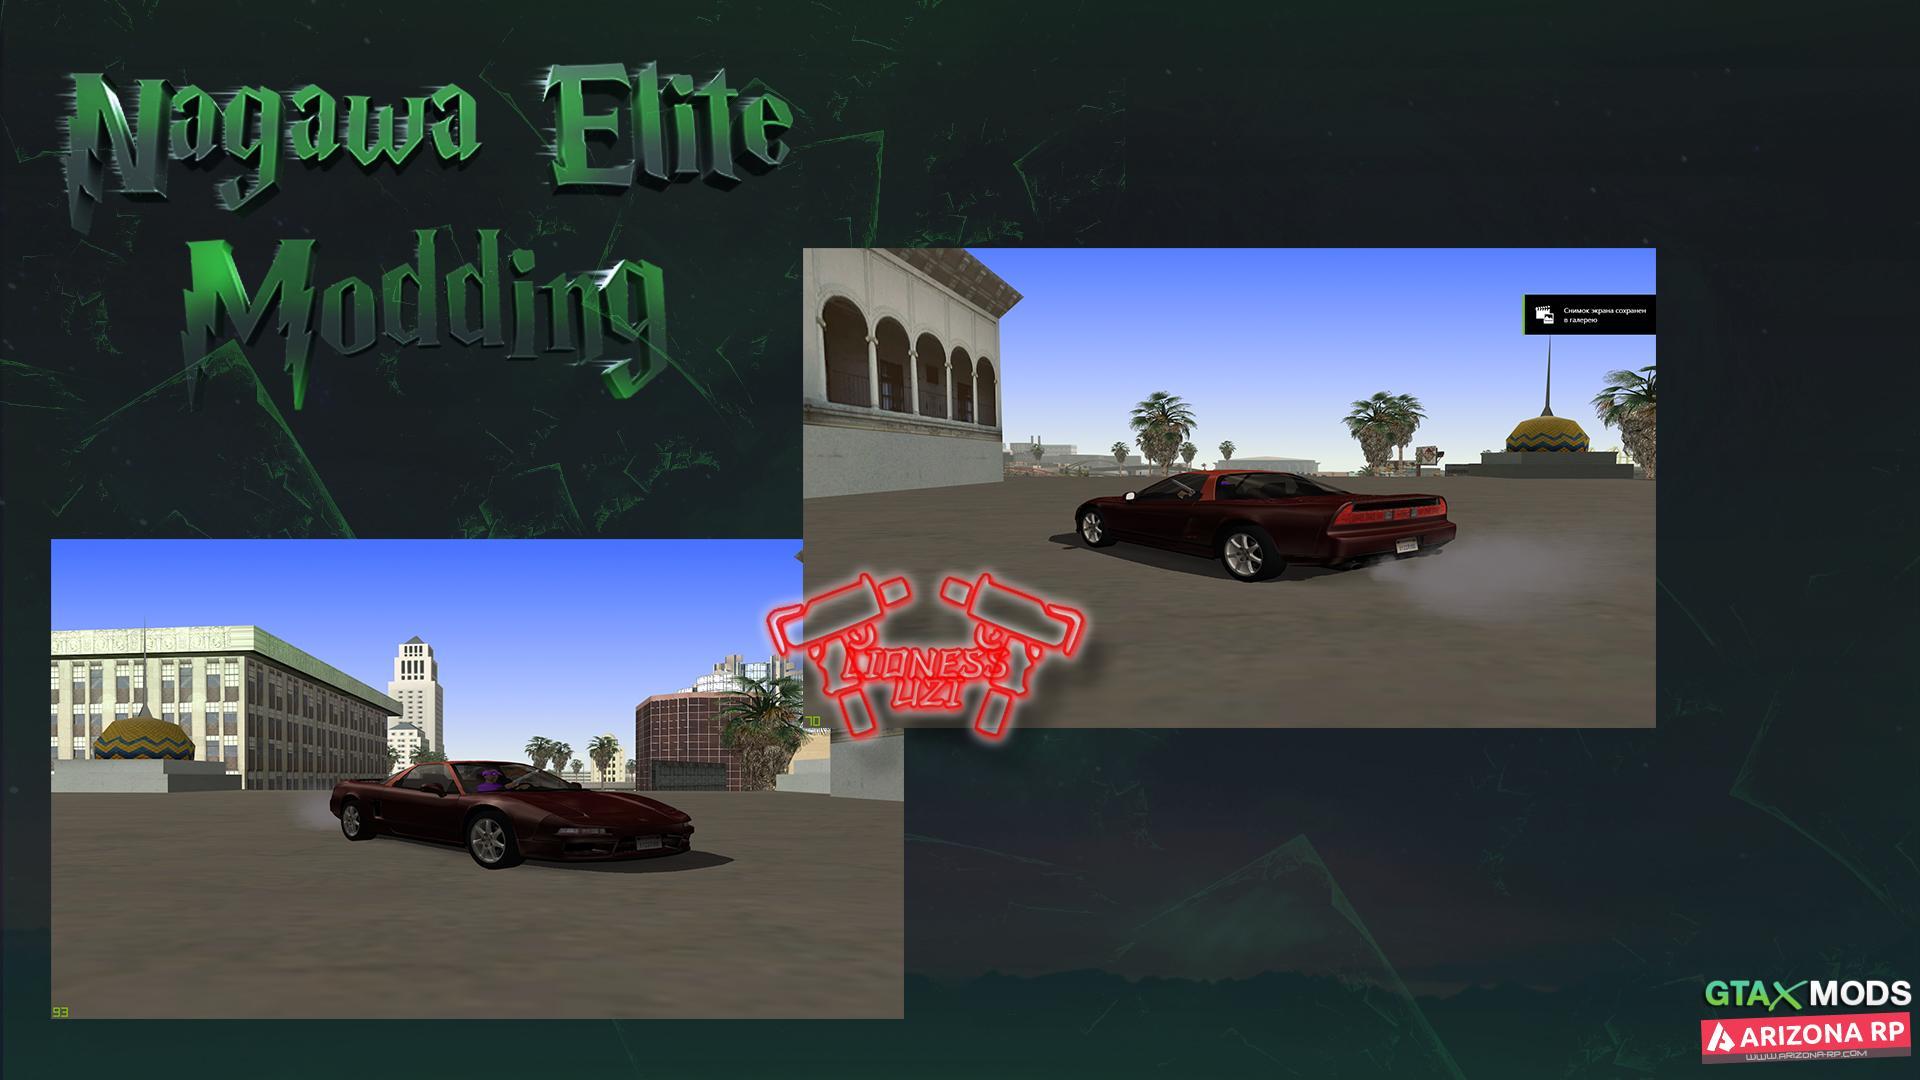 infernus ID 411 | Nagawa Elite Modding